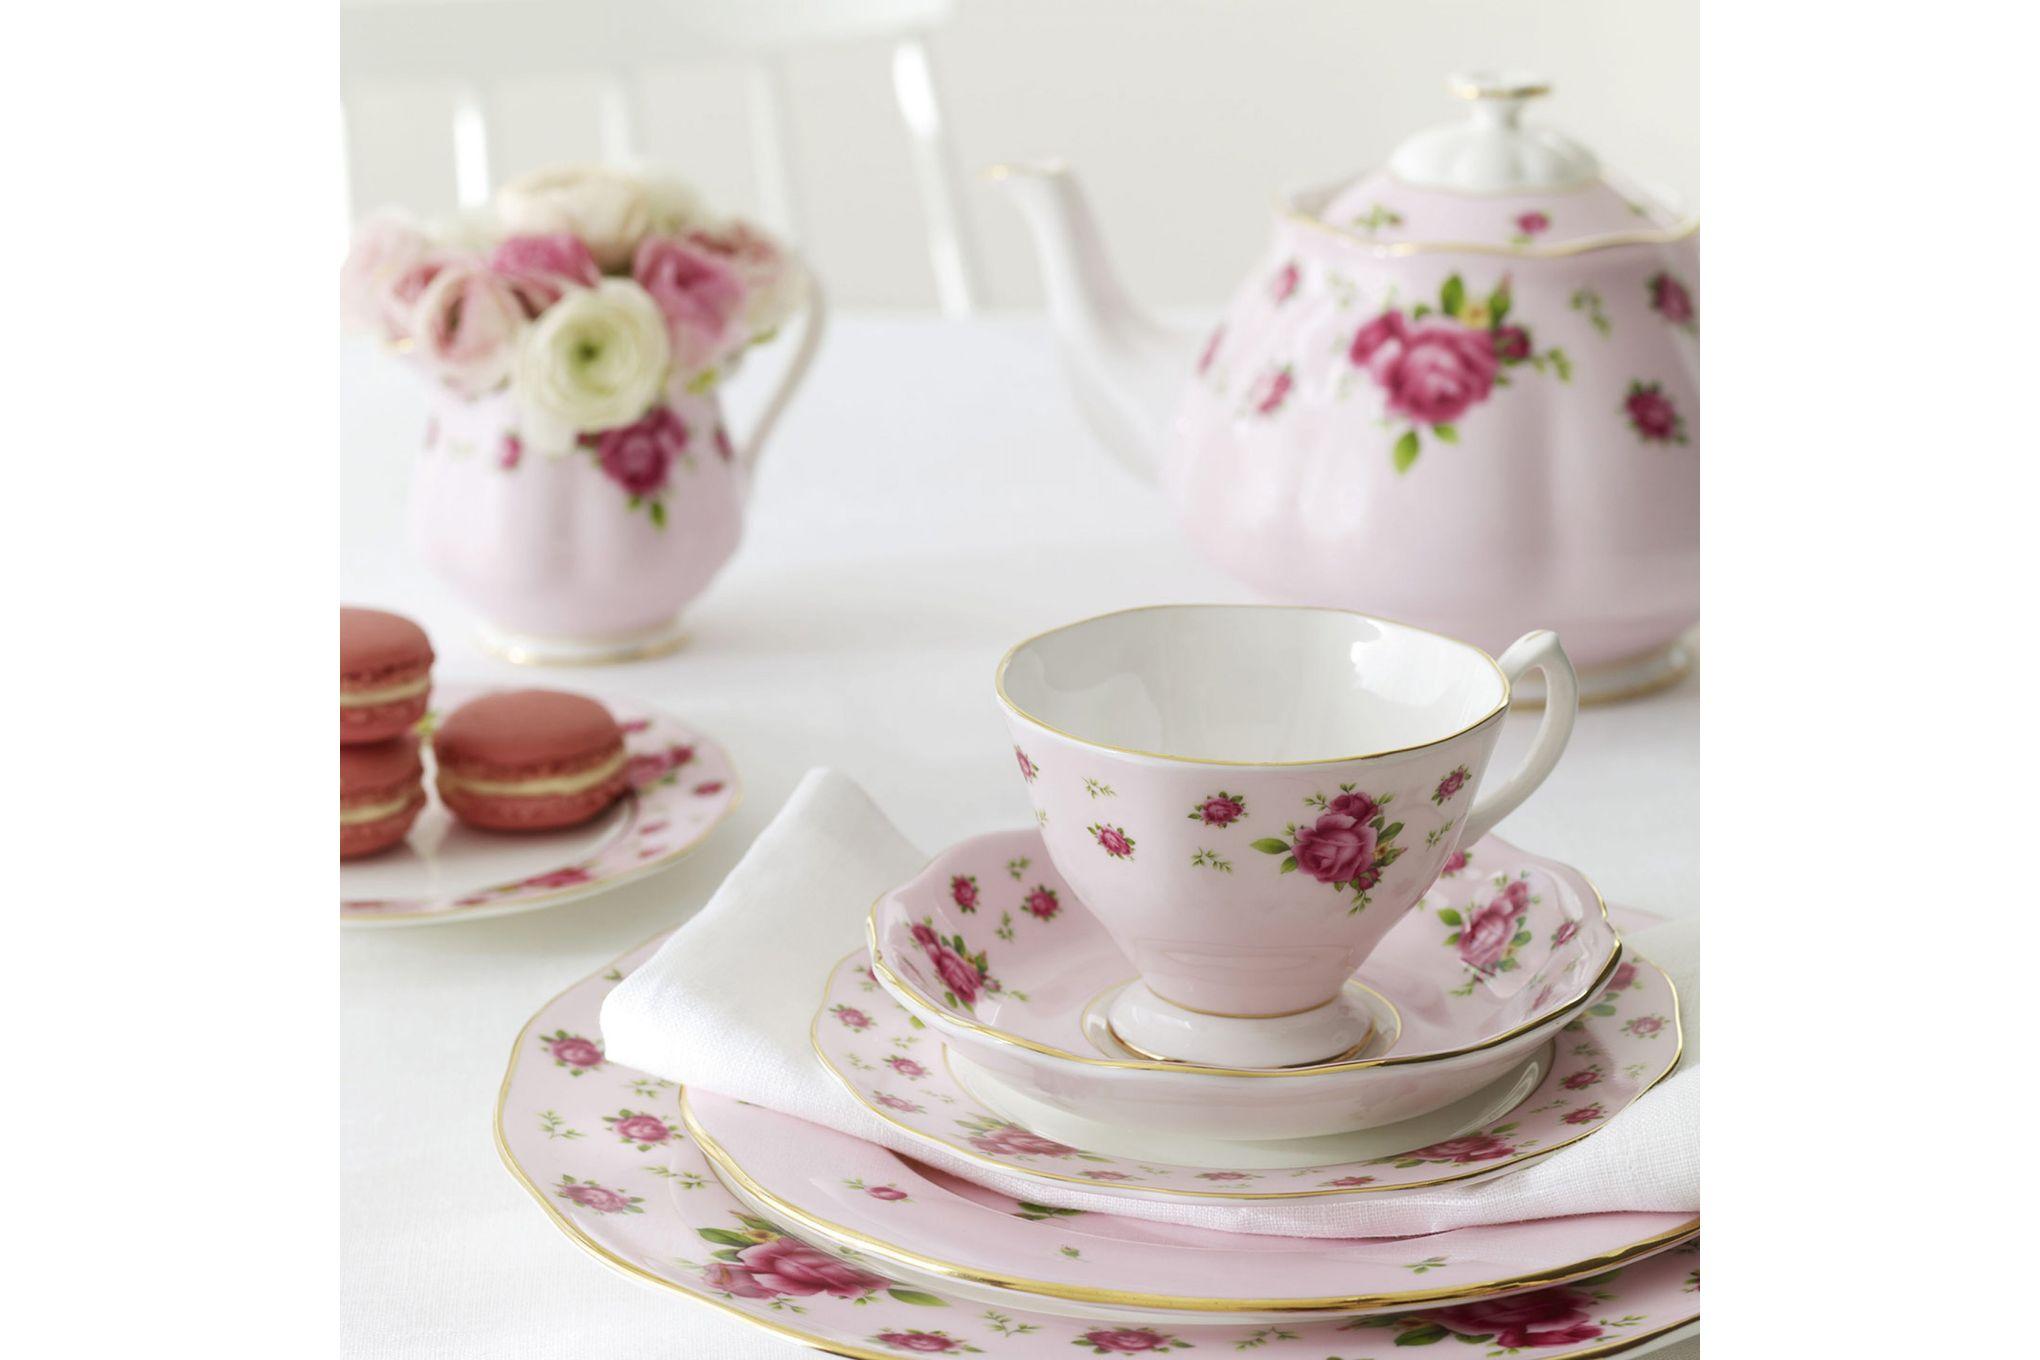 Royal Albert New Country Roses Pink Teapot 1.25l thumb 2